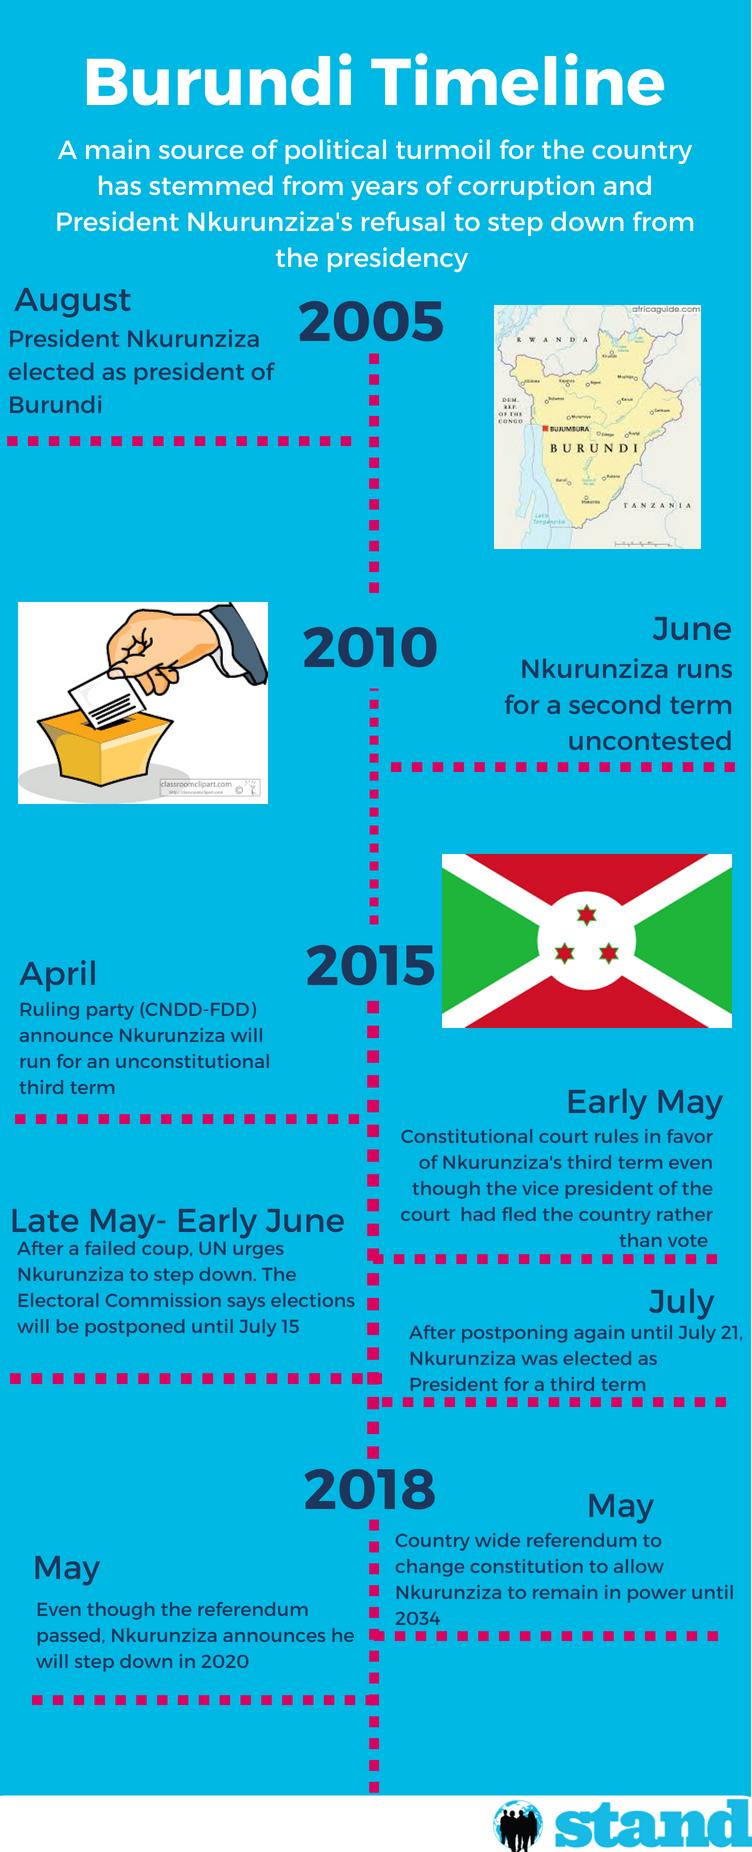 Burundi Timeline